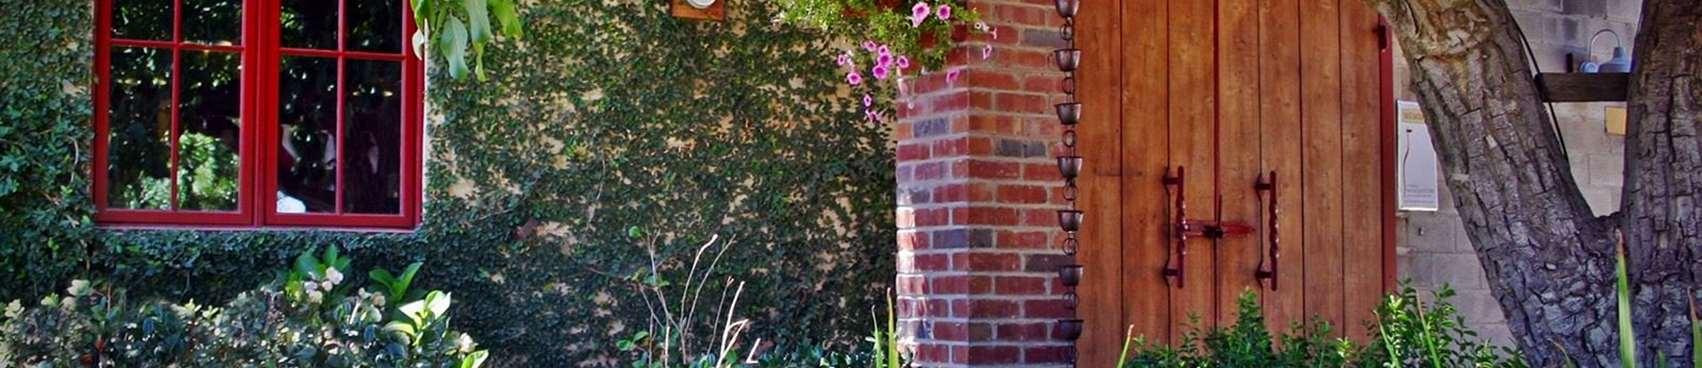 A image of Klinker Brick Winery